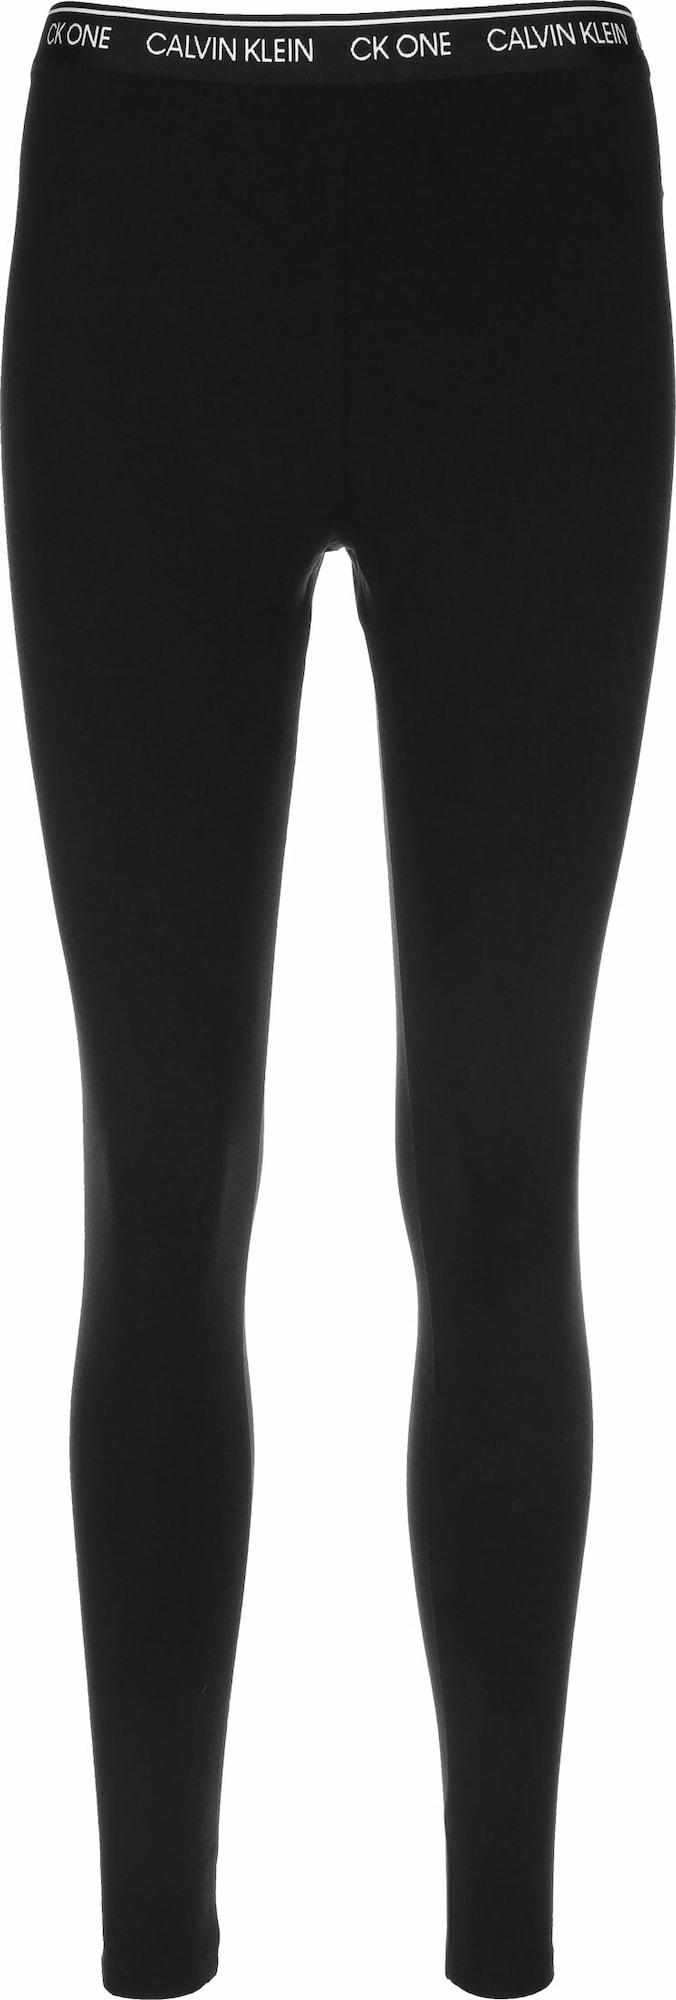 Calvin Klein Underwear Pižaminės kelnės balta / juoda